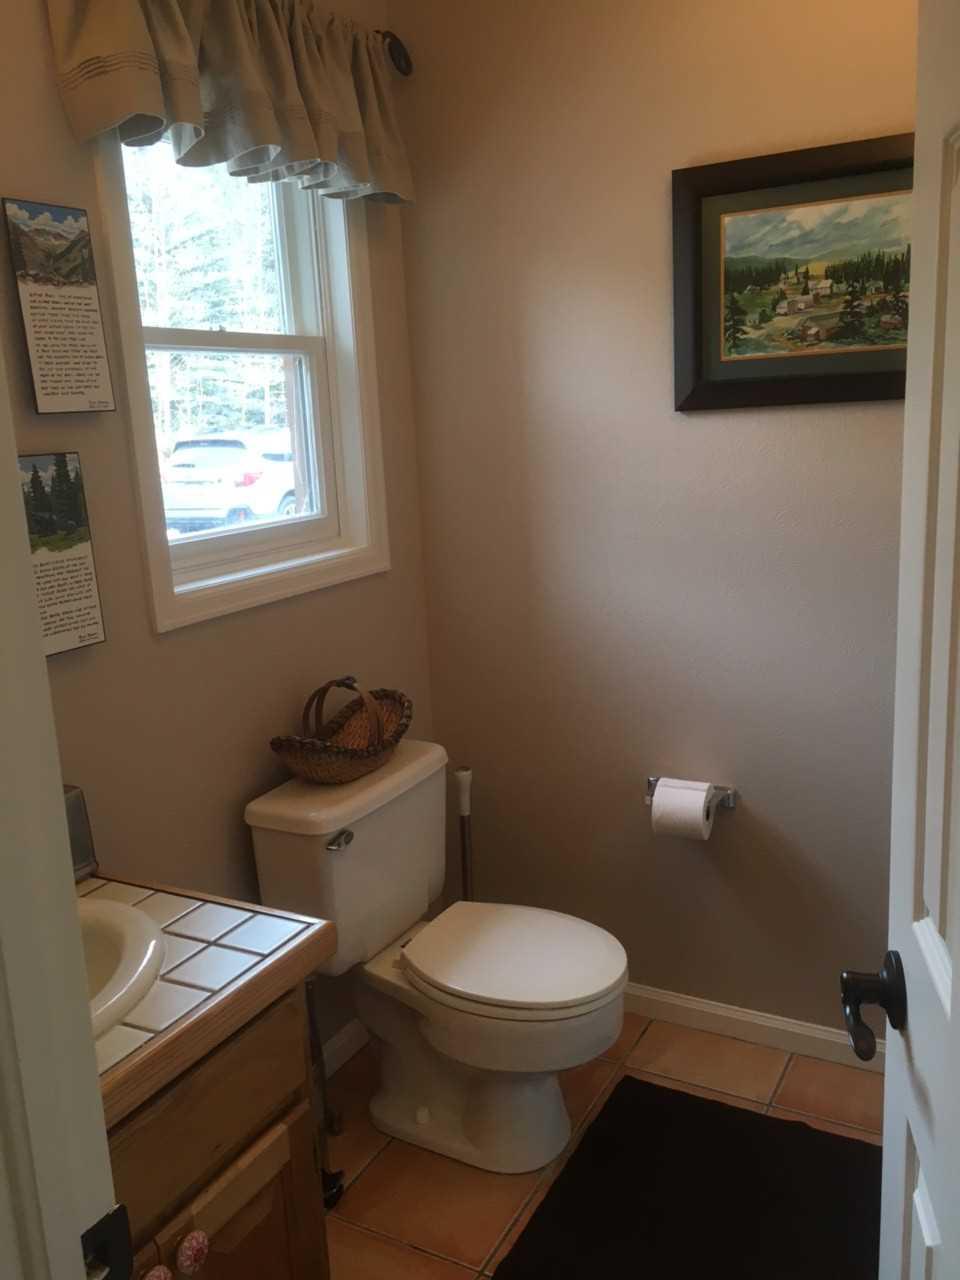 Downstairs 1/4 Bathroom